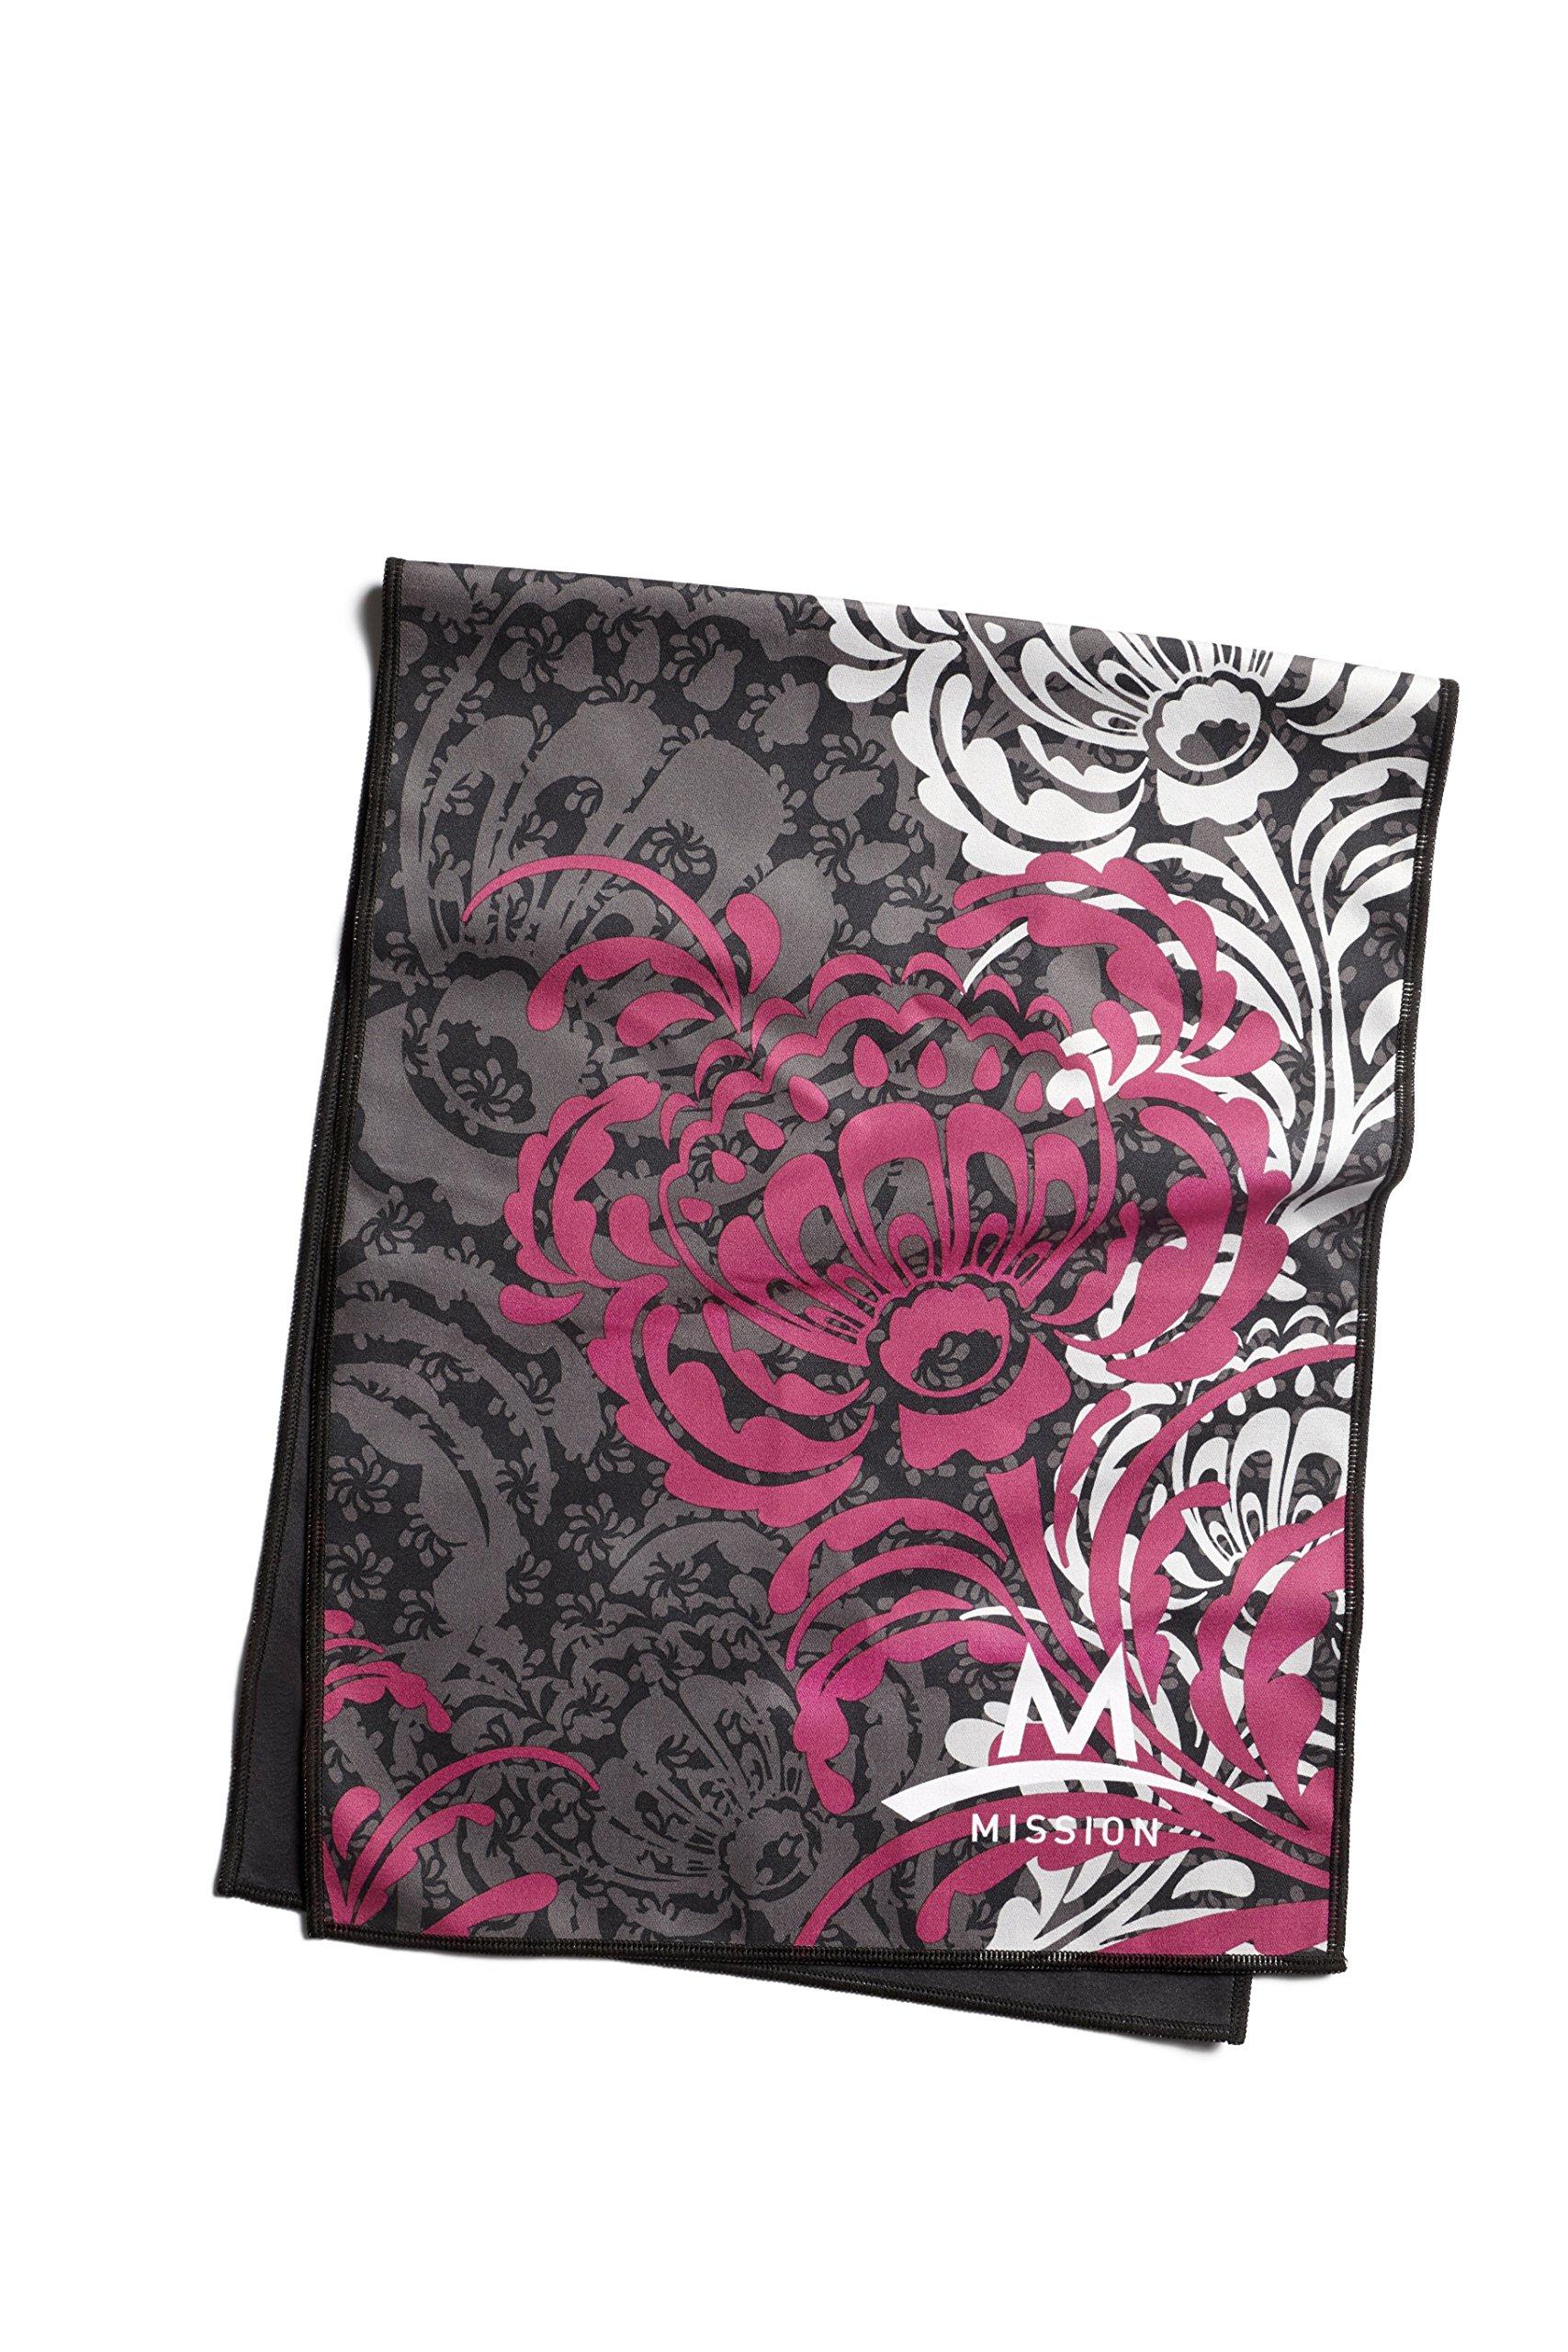 Mission Enduracool Microfiber Cooling Towel, Black Magenta, Large by Mission